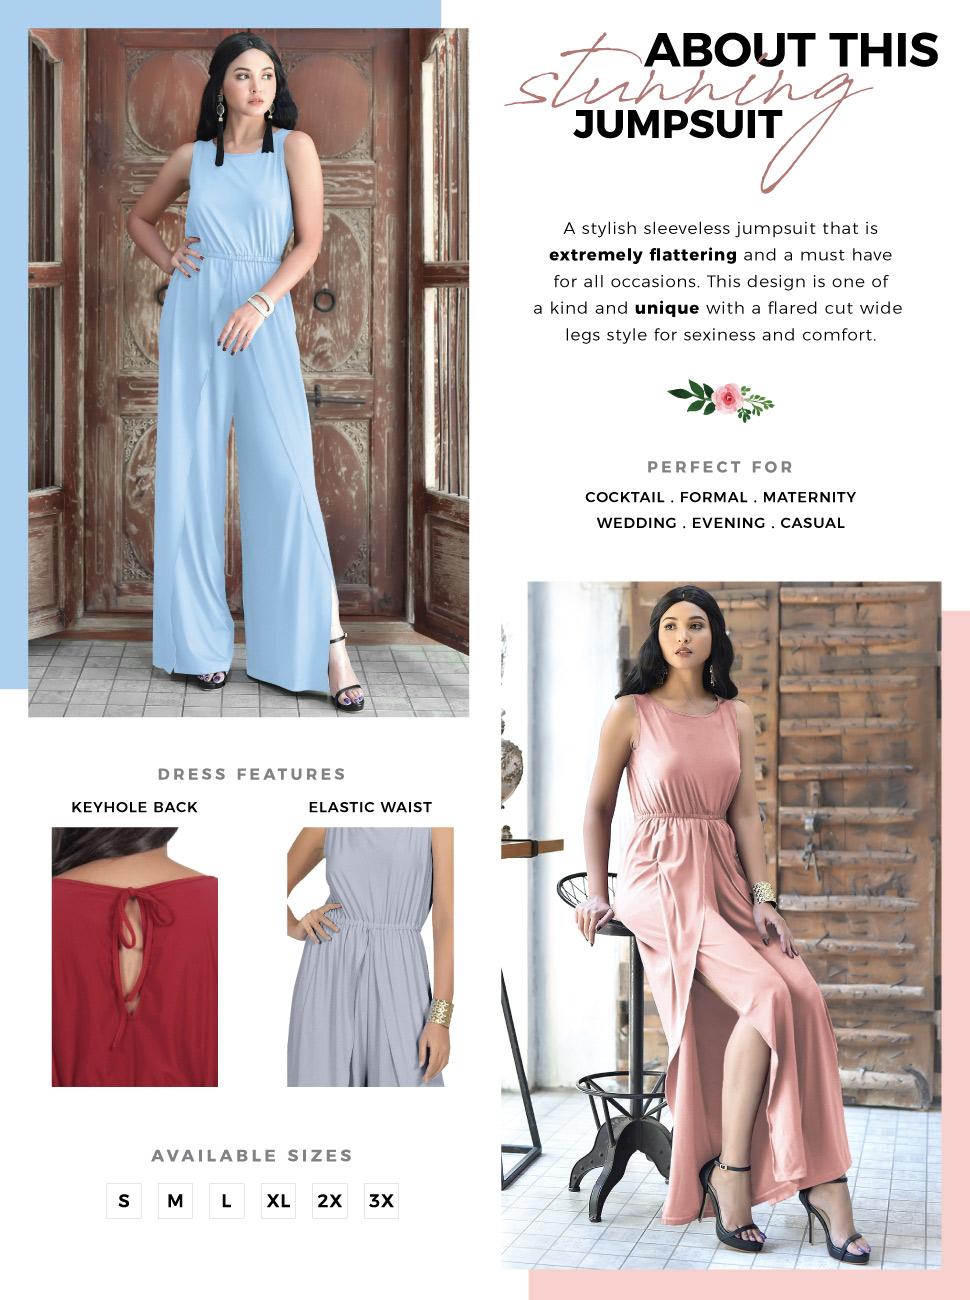 womens plus size glamorous party cocktail evening jumpsuit sleeveless style  high slit design trend. womens ladies elegant stunning maxi dress ... 30932437d